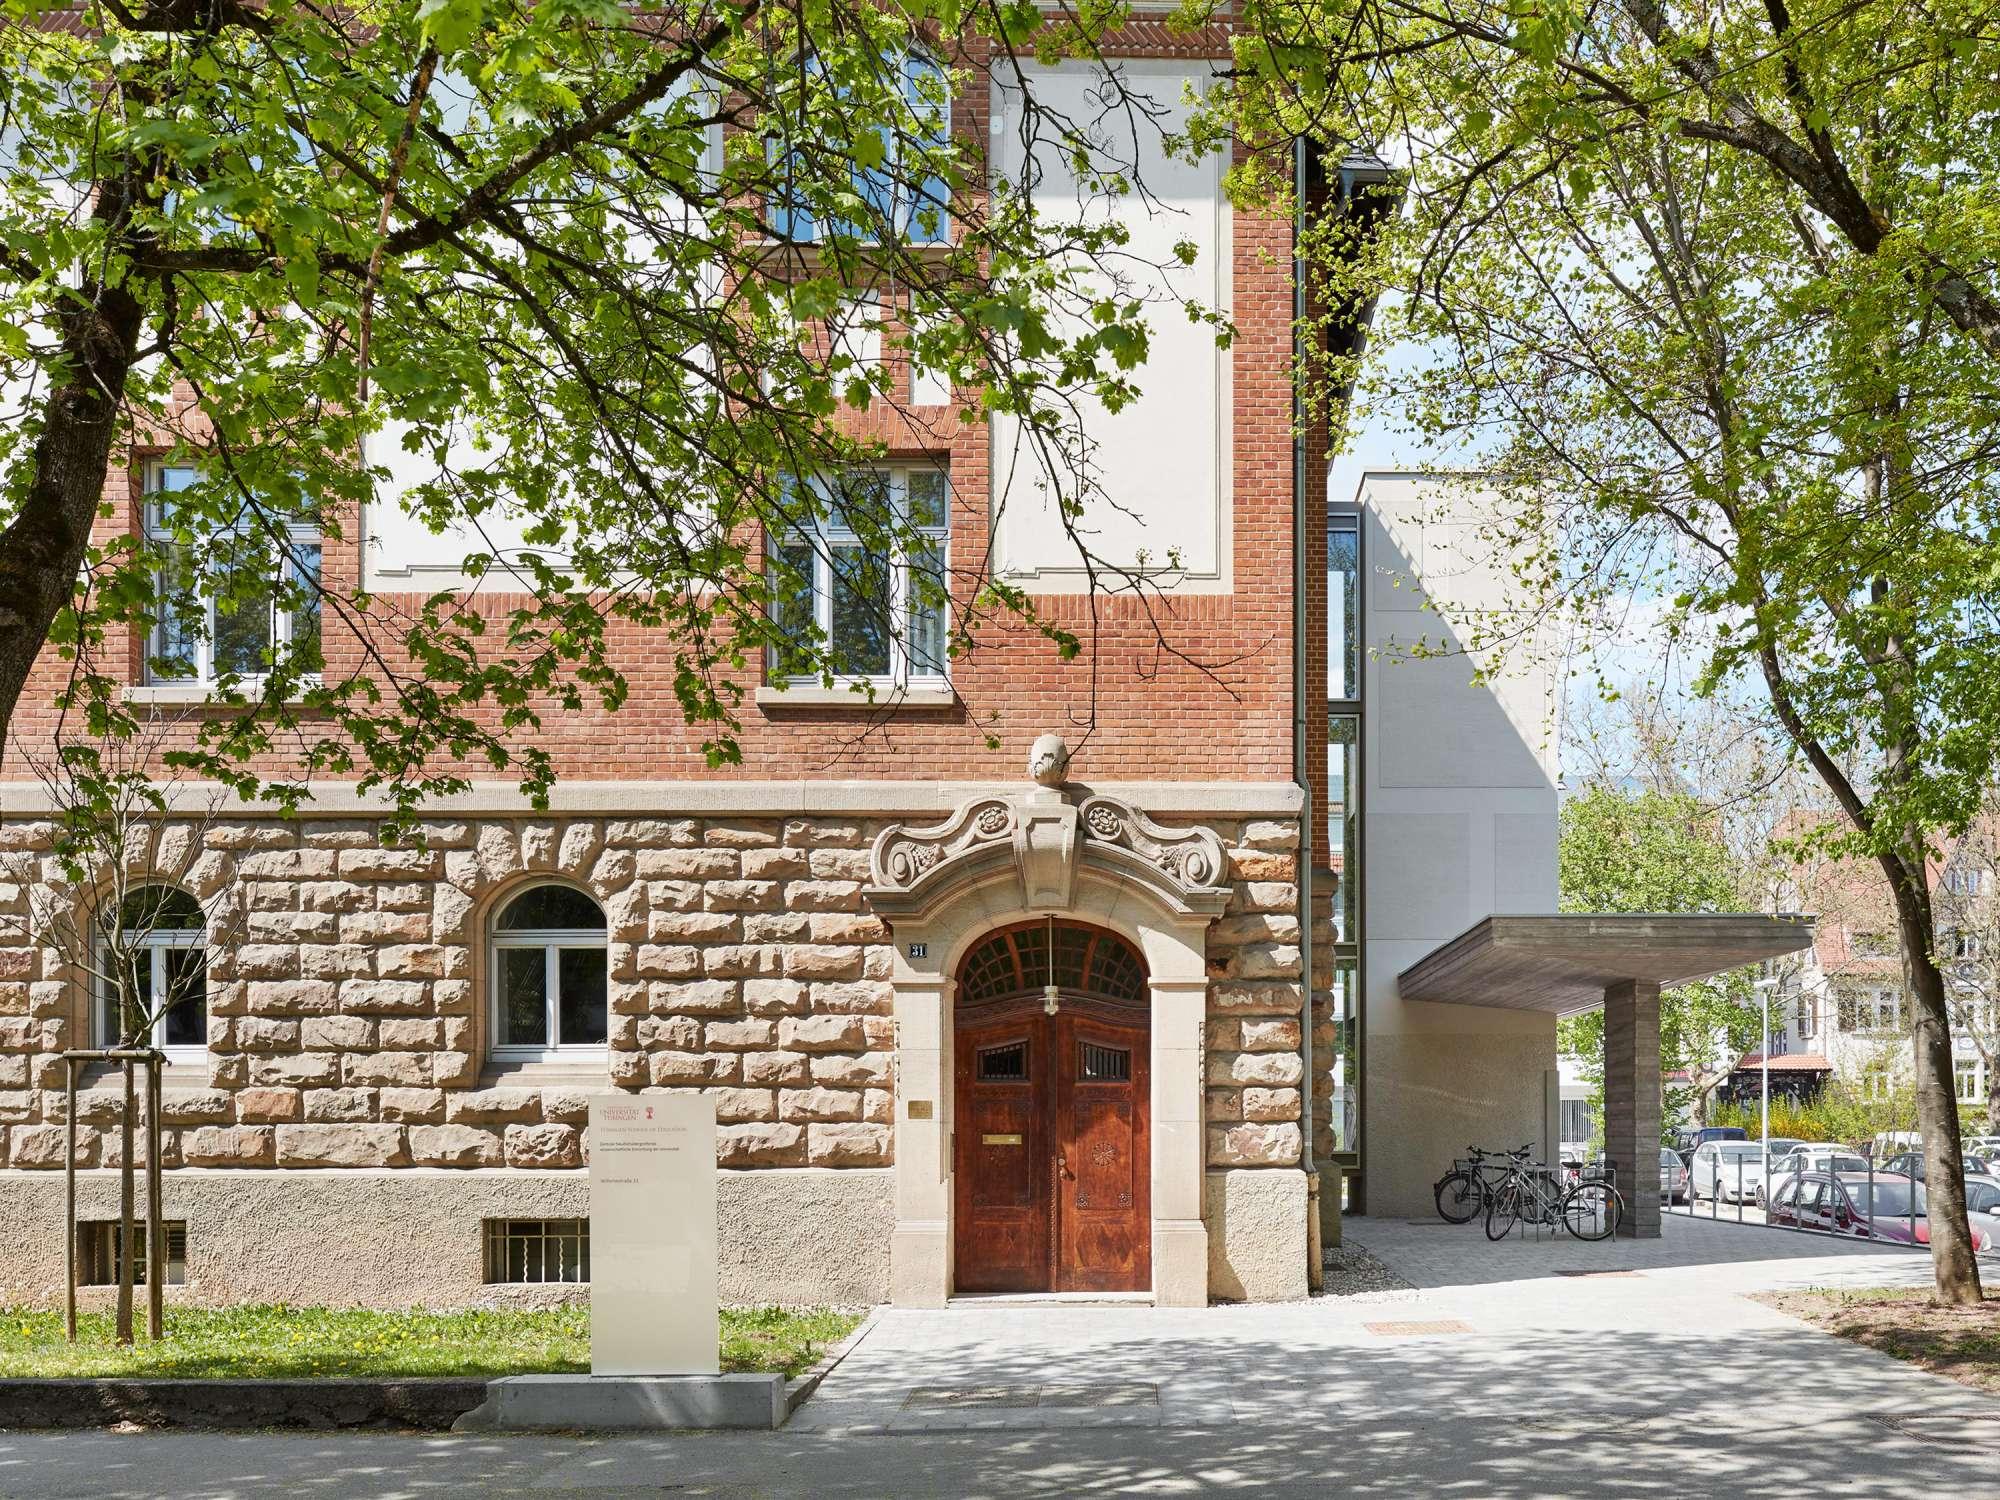 Umbau denkmalgeschützter Direktorenvilla zur neuen ›School of Education‹